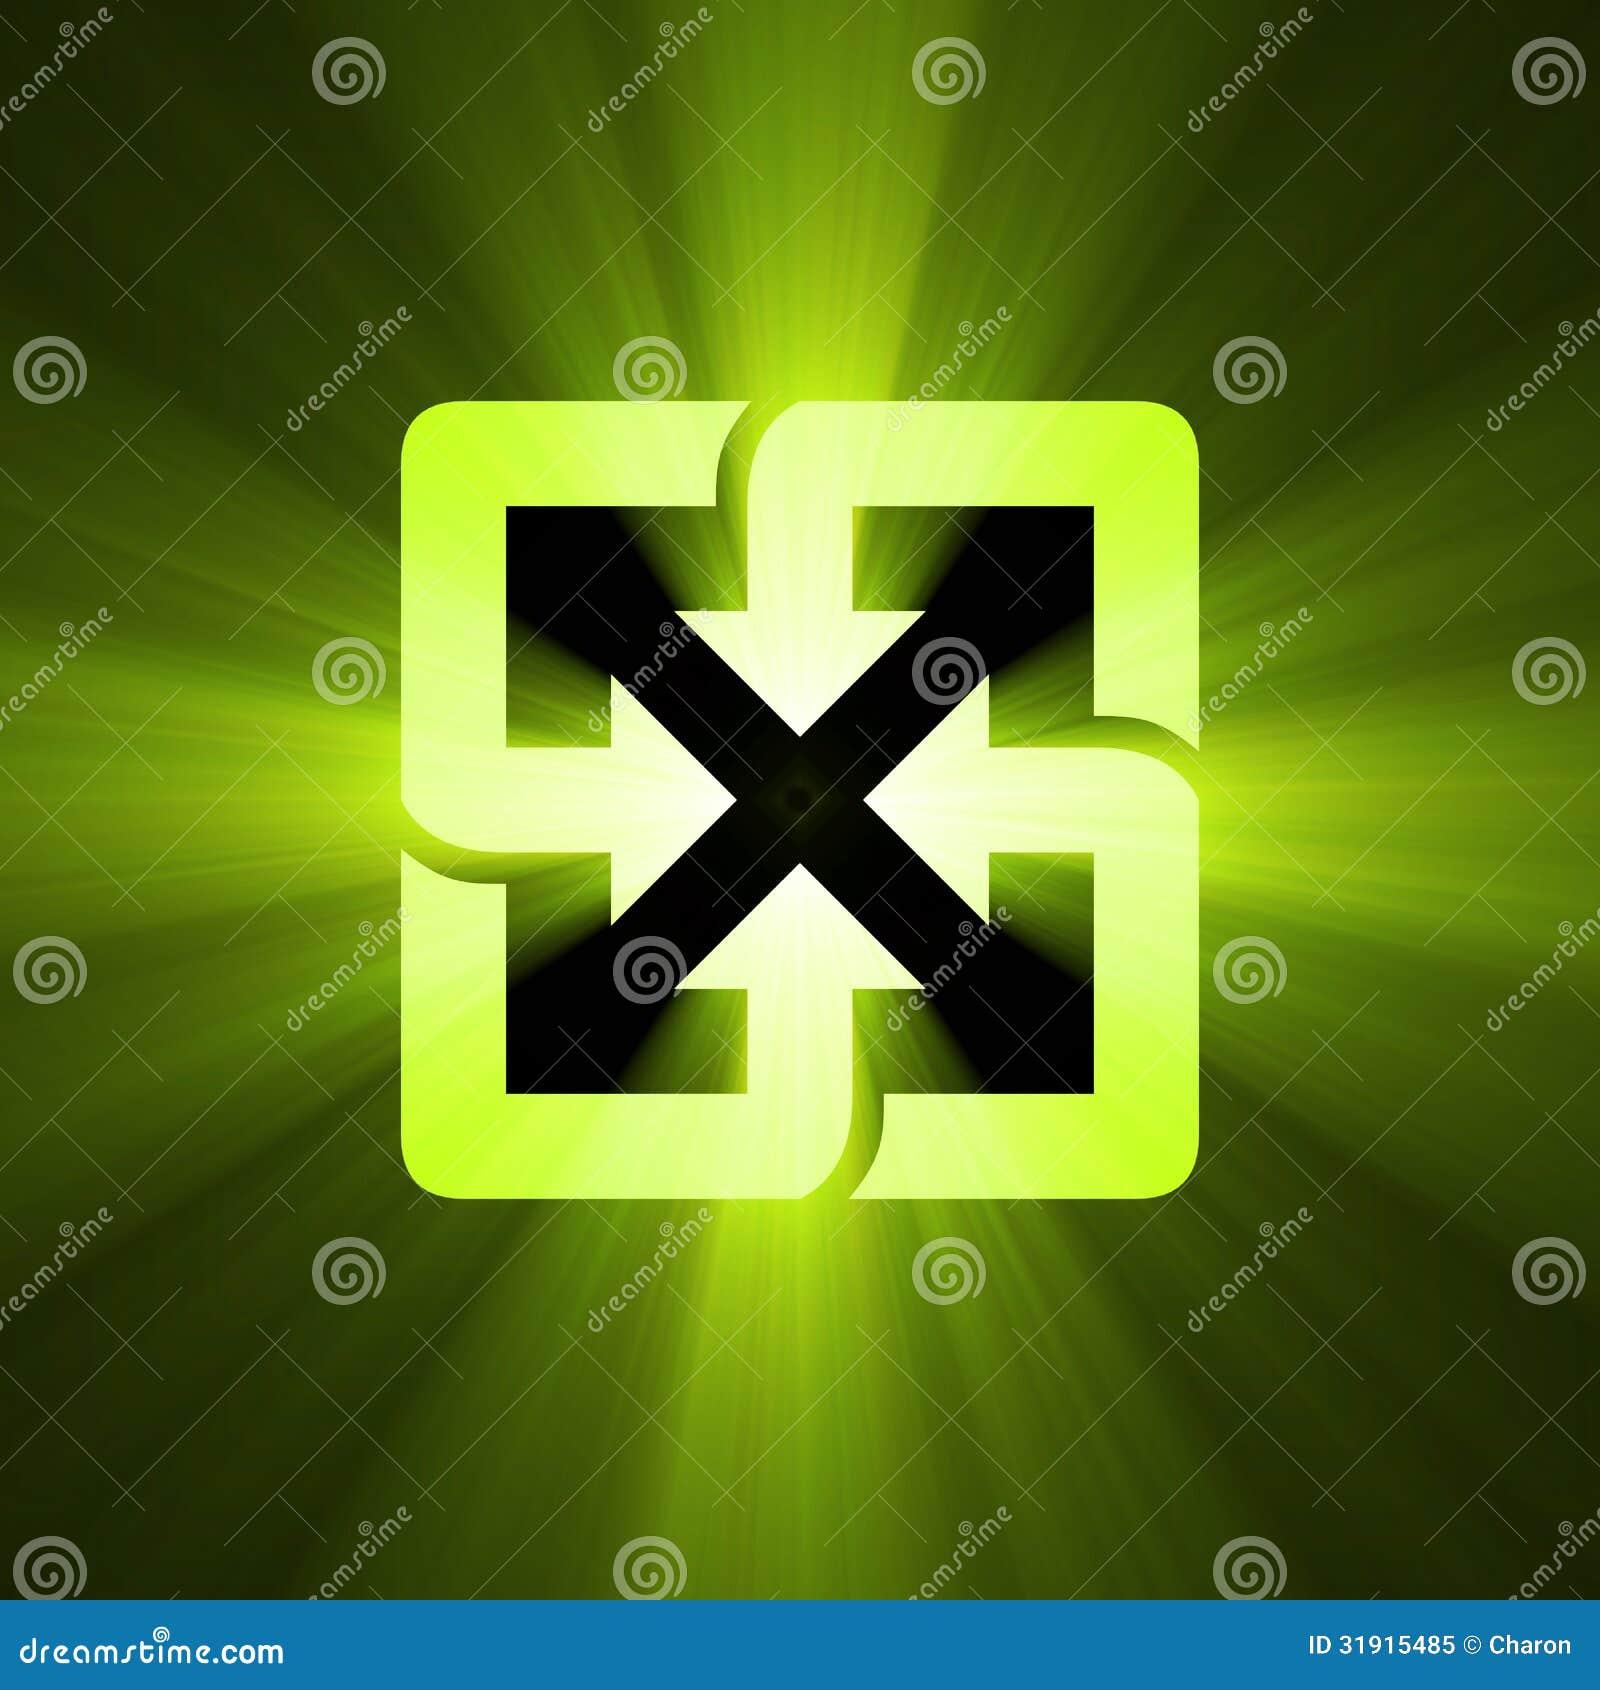 Recycle symbol green light flare stock illustration illustration recycle symbol green light flare buycottarizona Choice Image